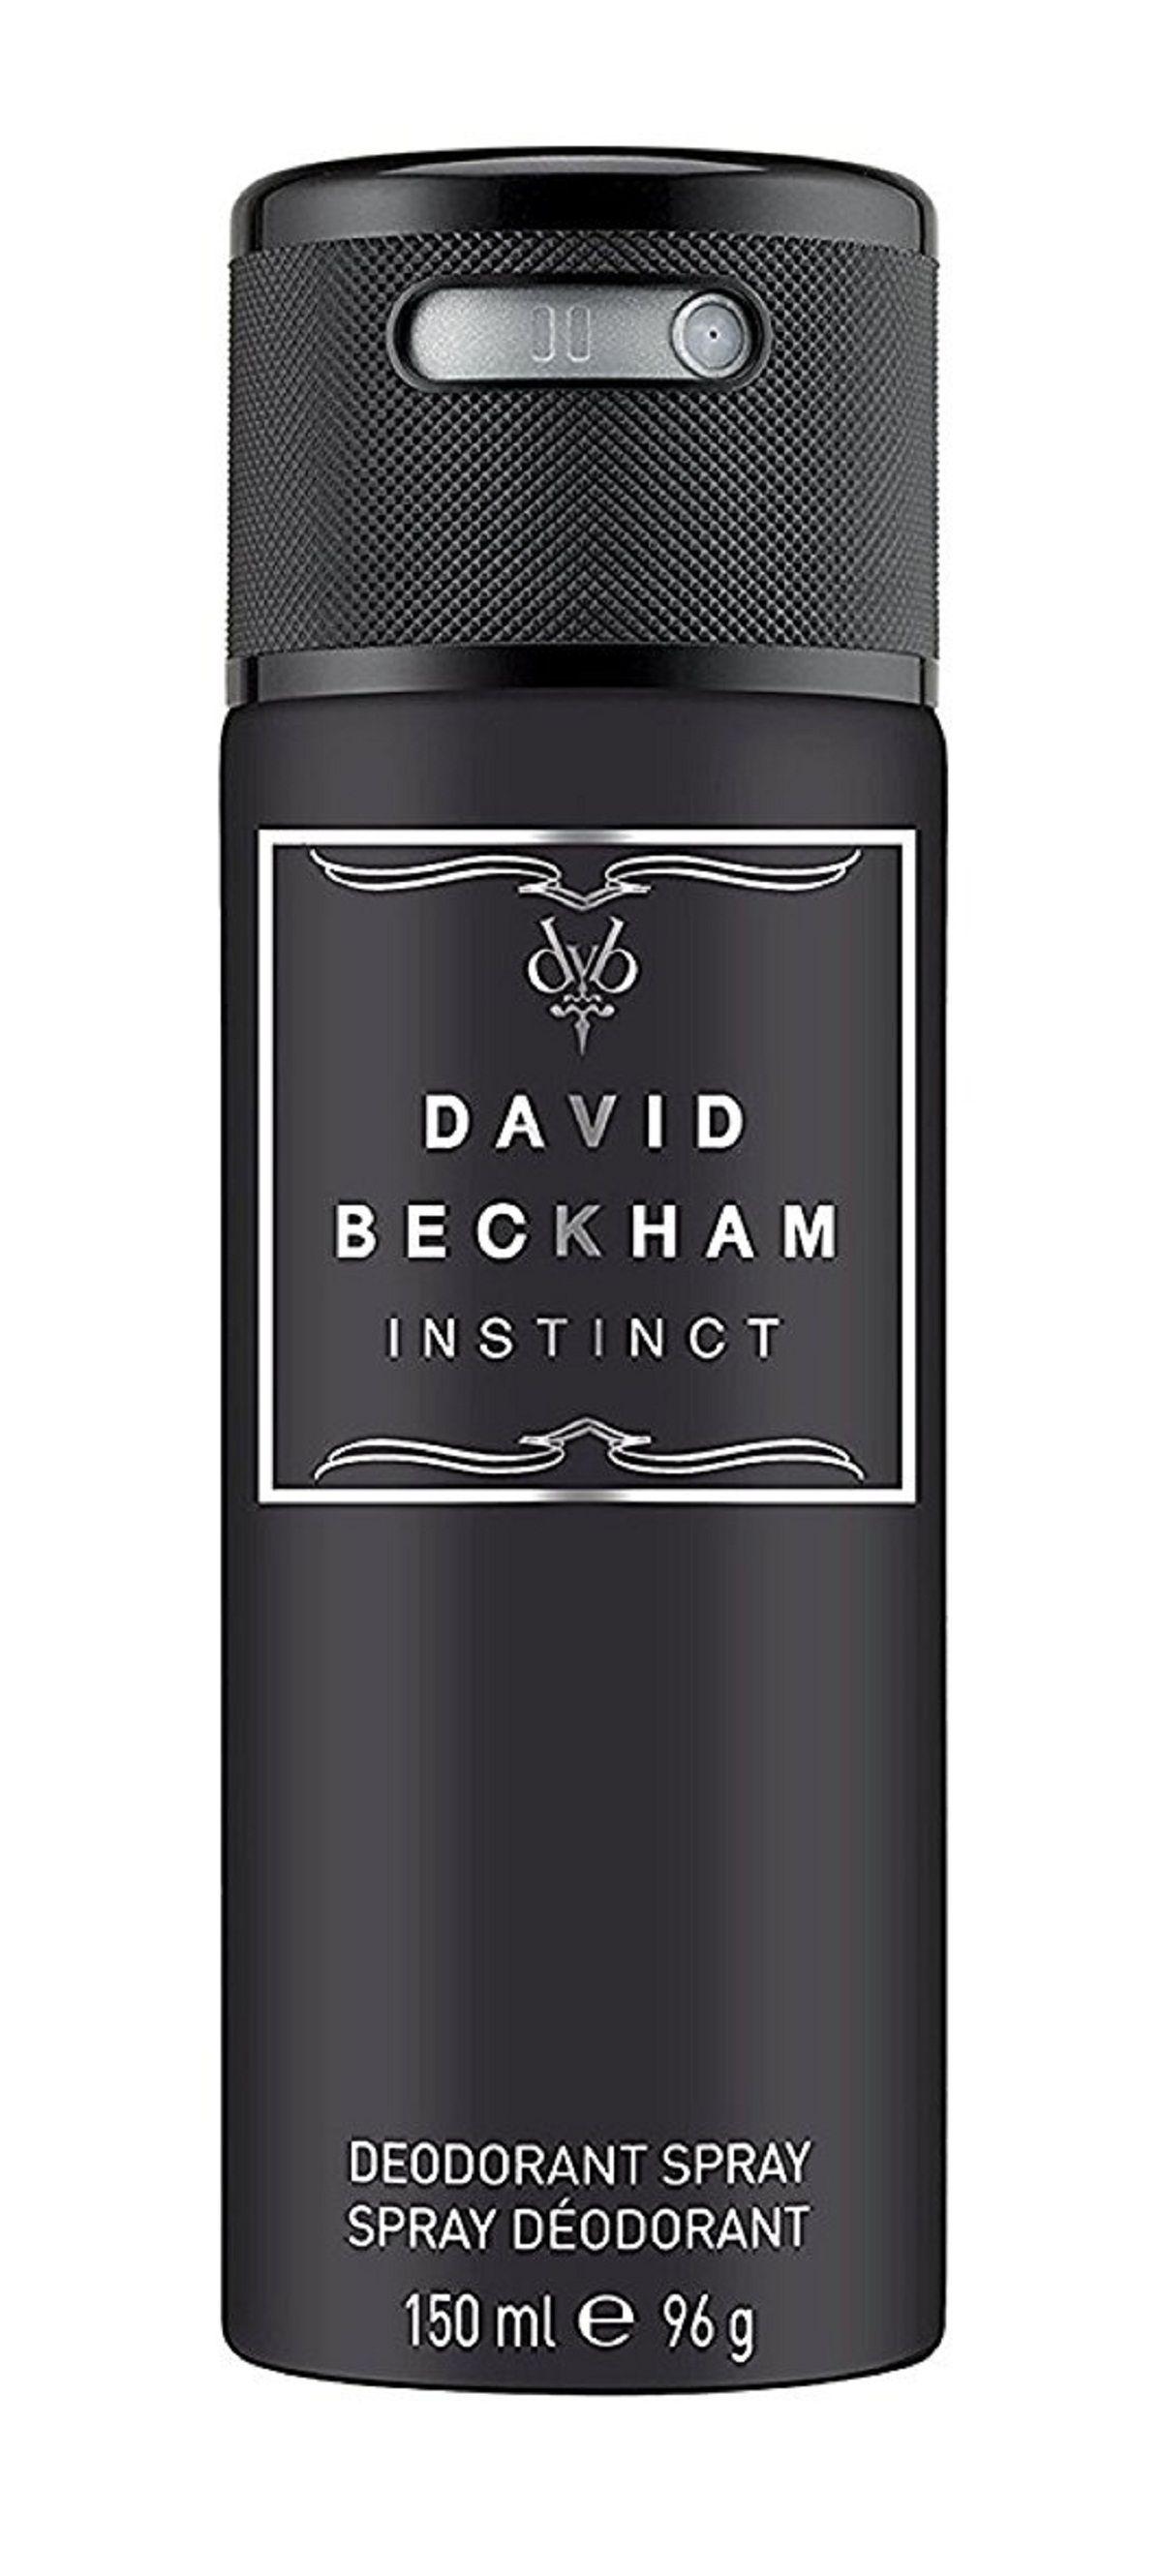 David Beckham Instinct Deodorant 150ml Buy Online At Best Prices In